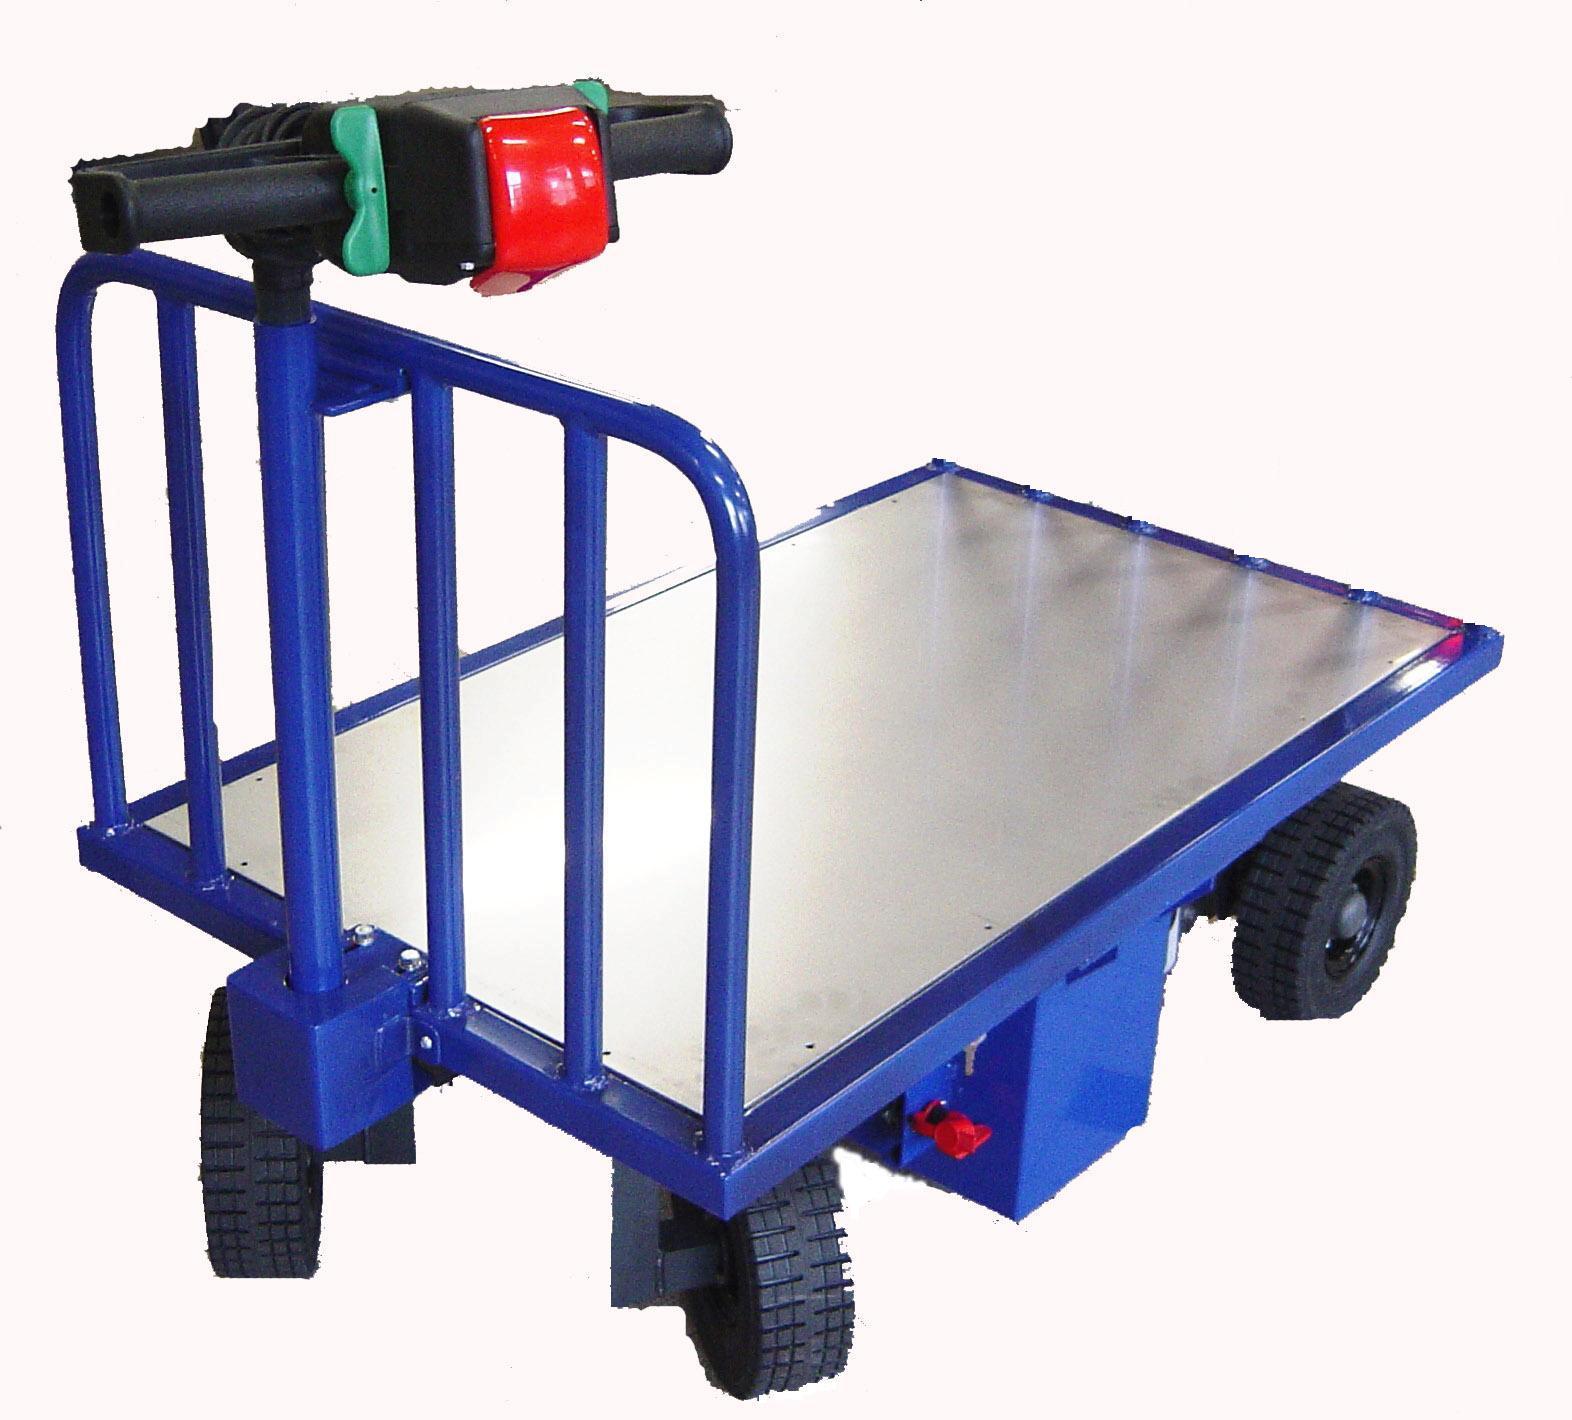 LFP battery industrial trolley